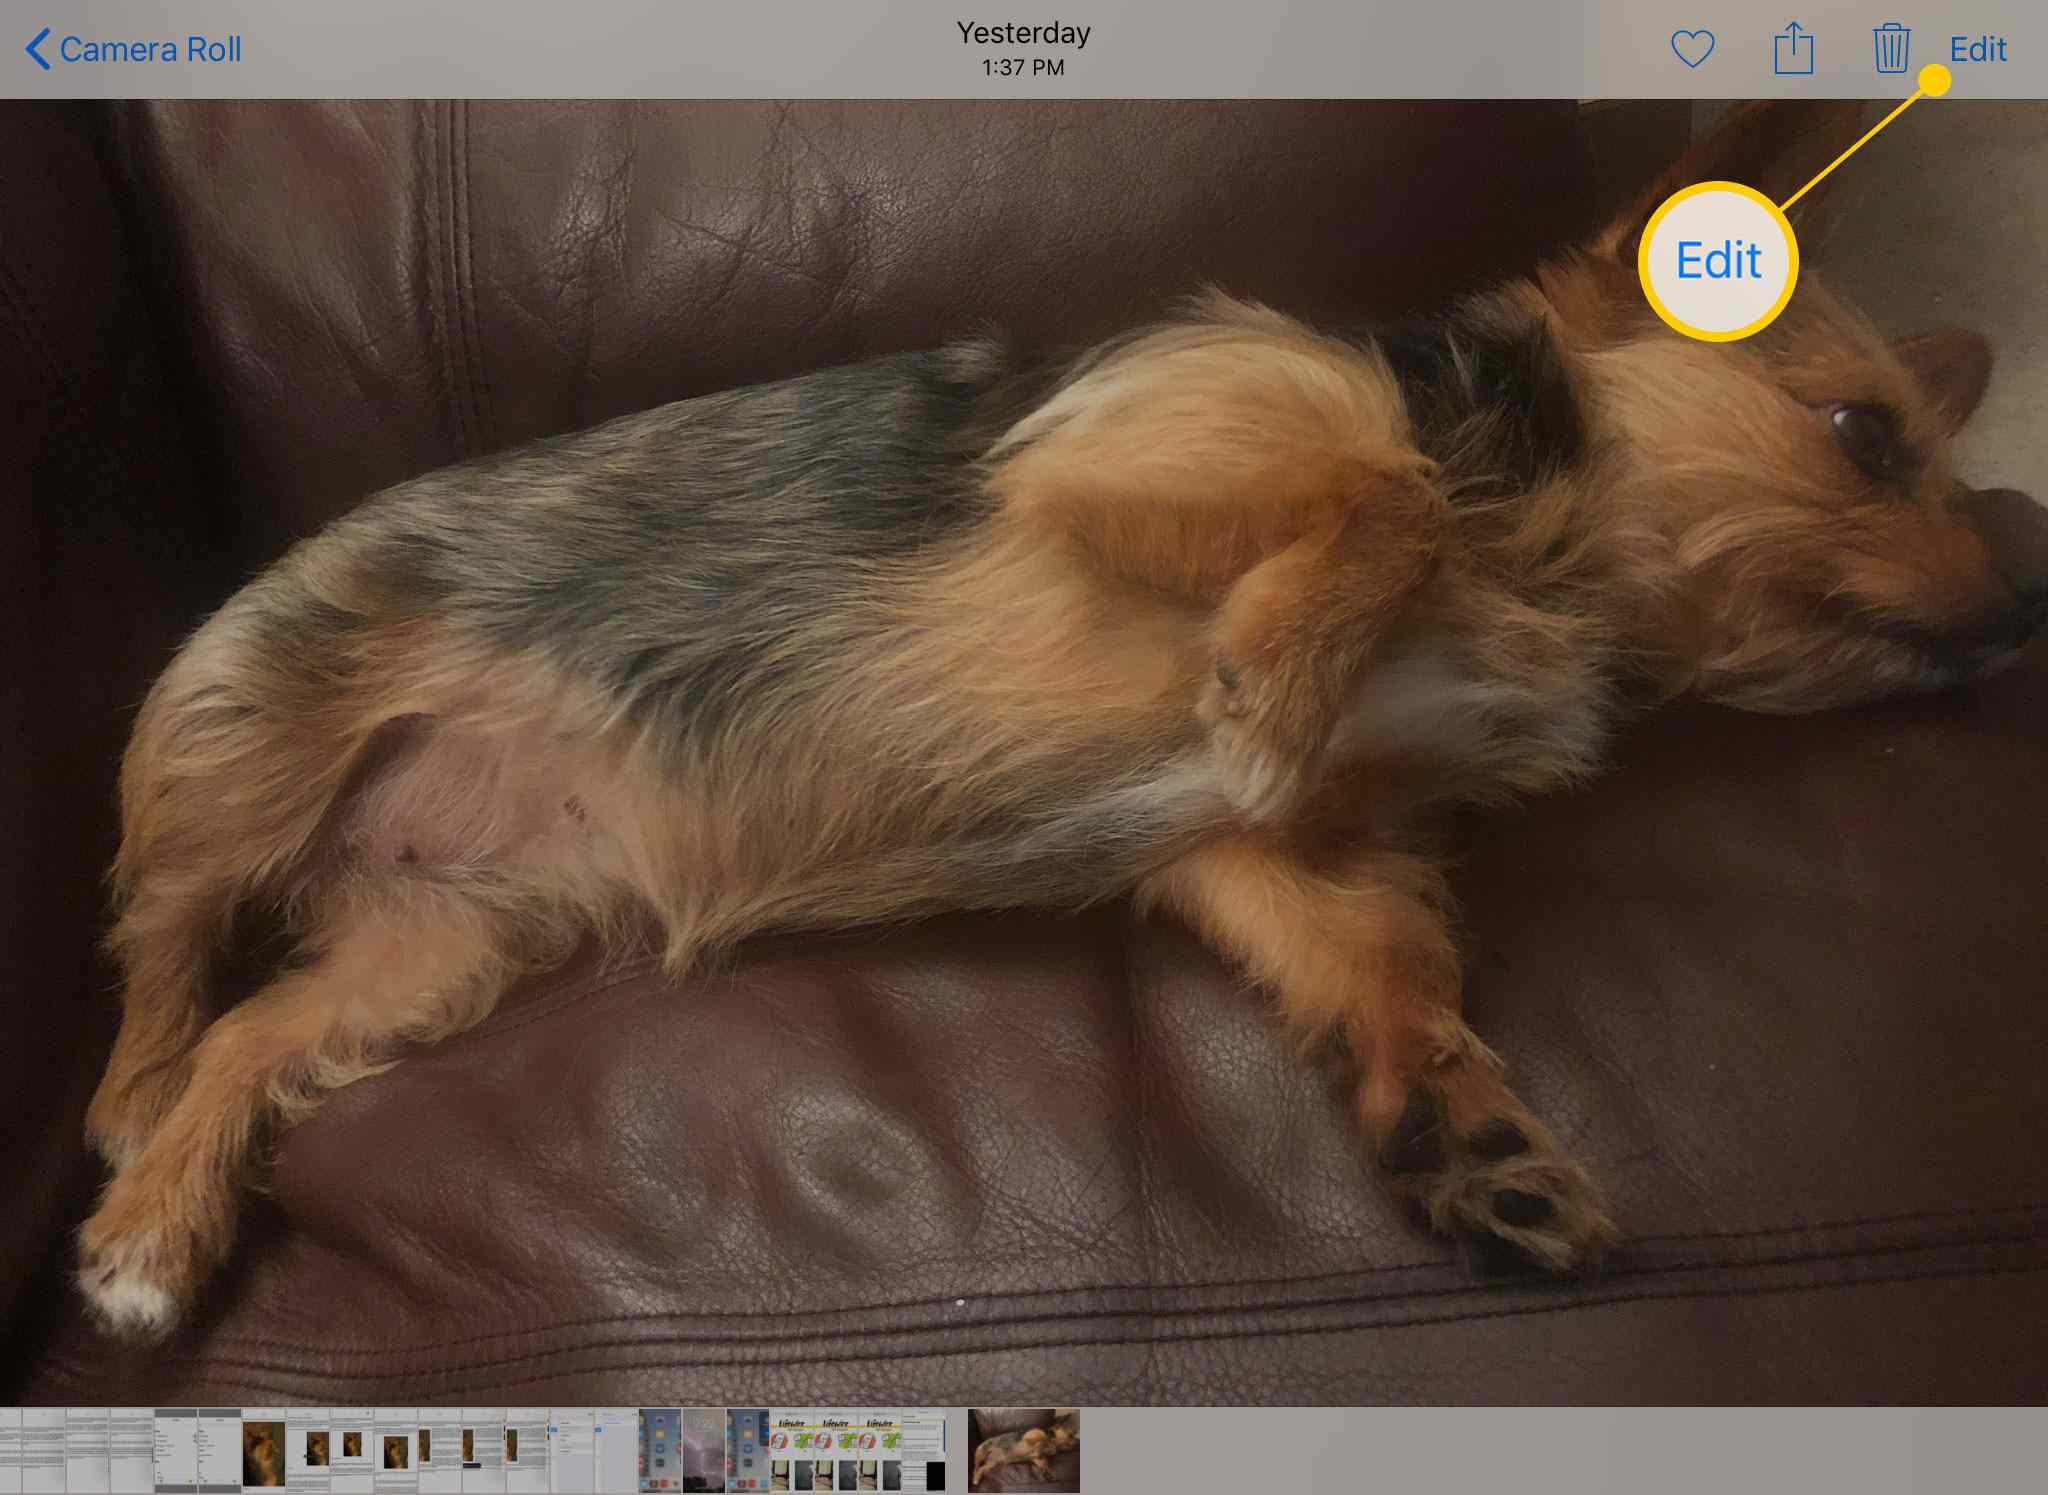 The Edit button in Photos on an iPad